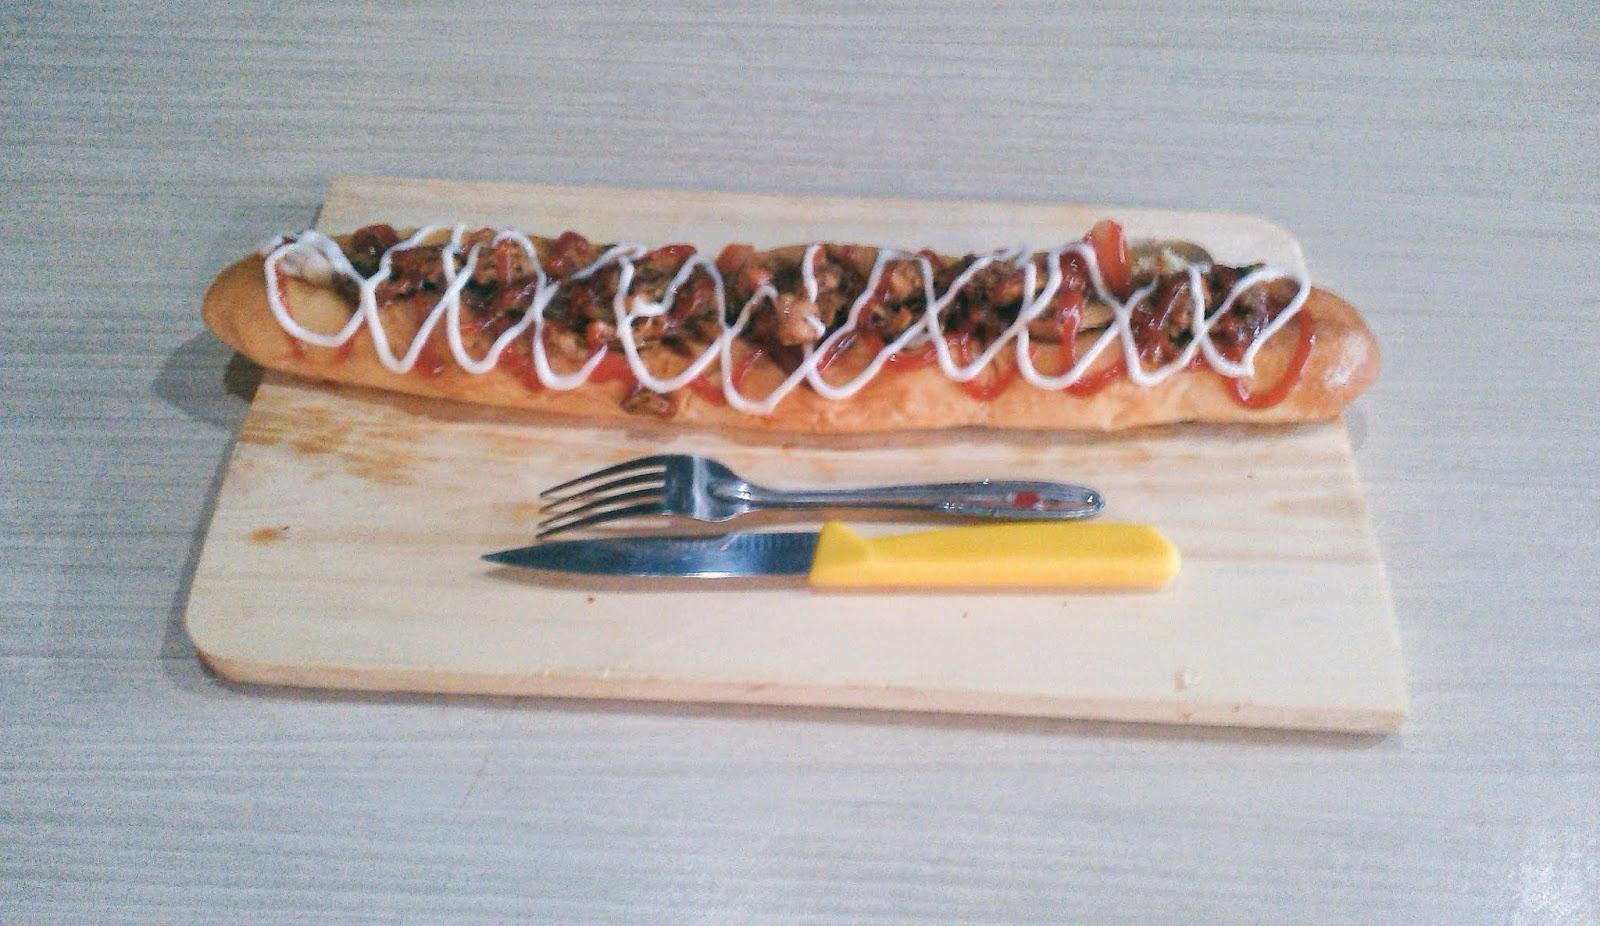 Big Bro's Kitchen: Nongkrong Jadi Lebih Lama